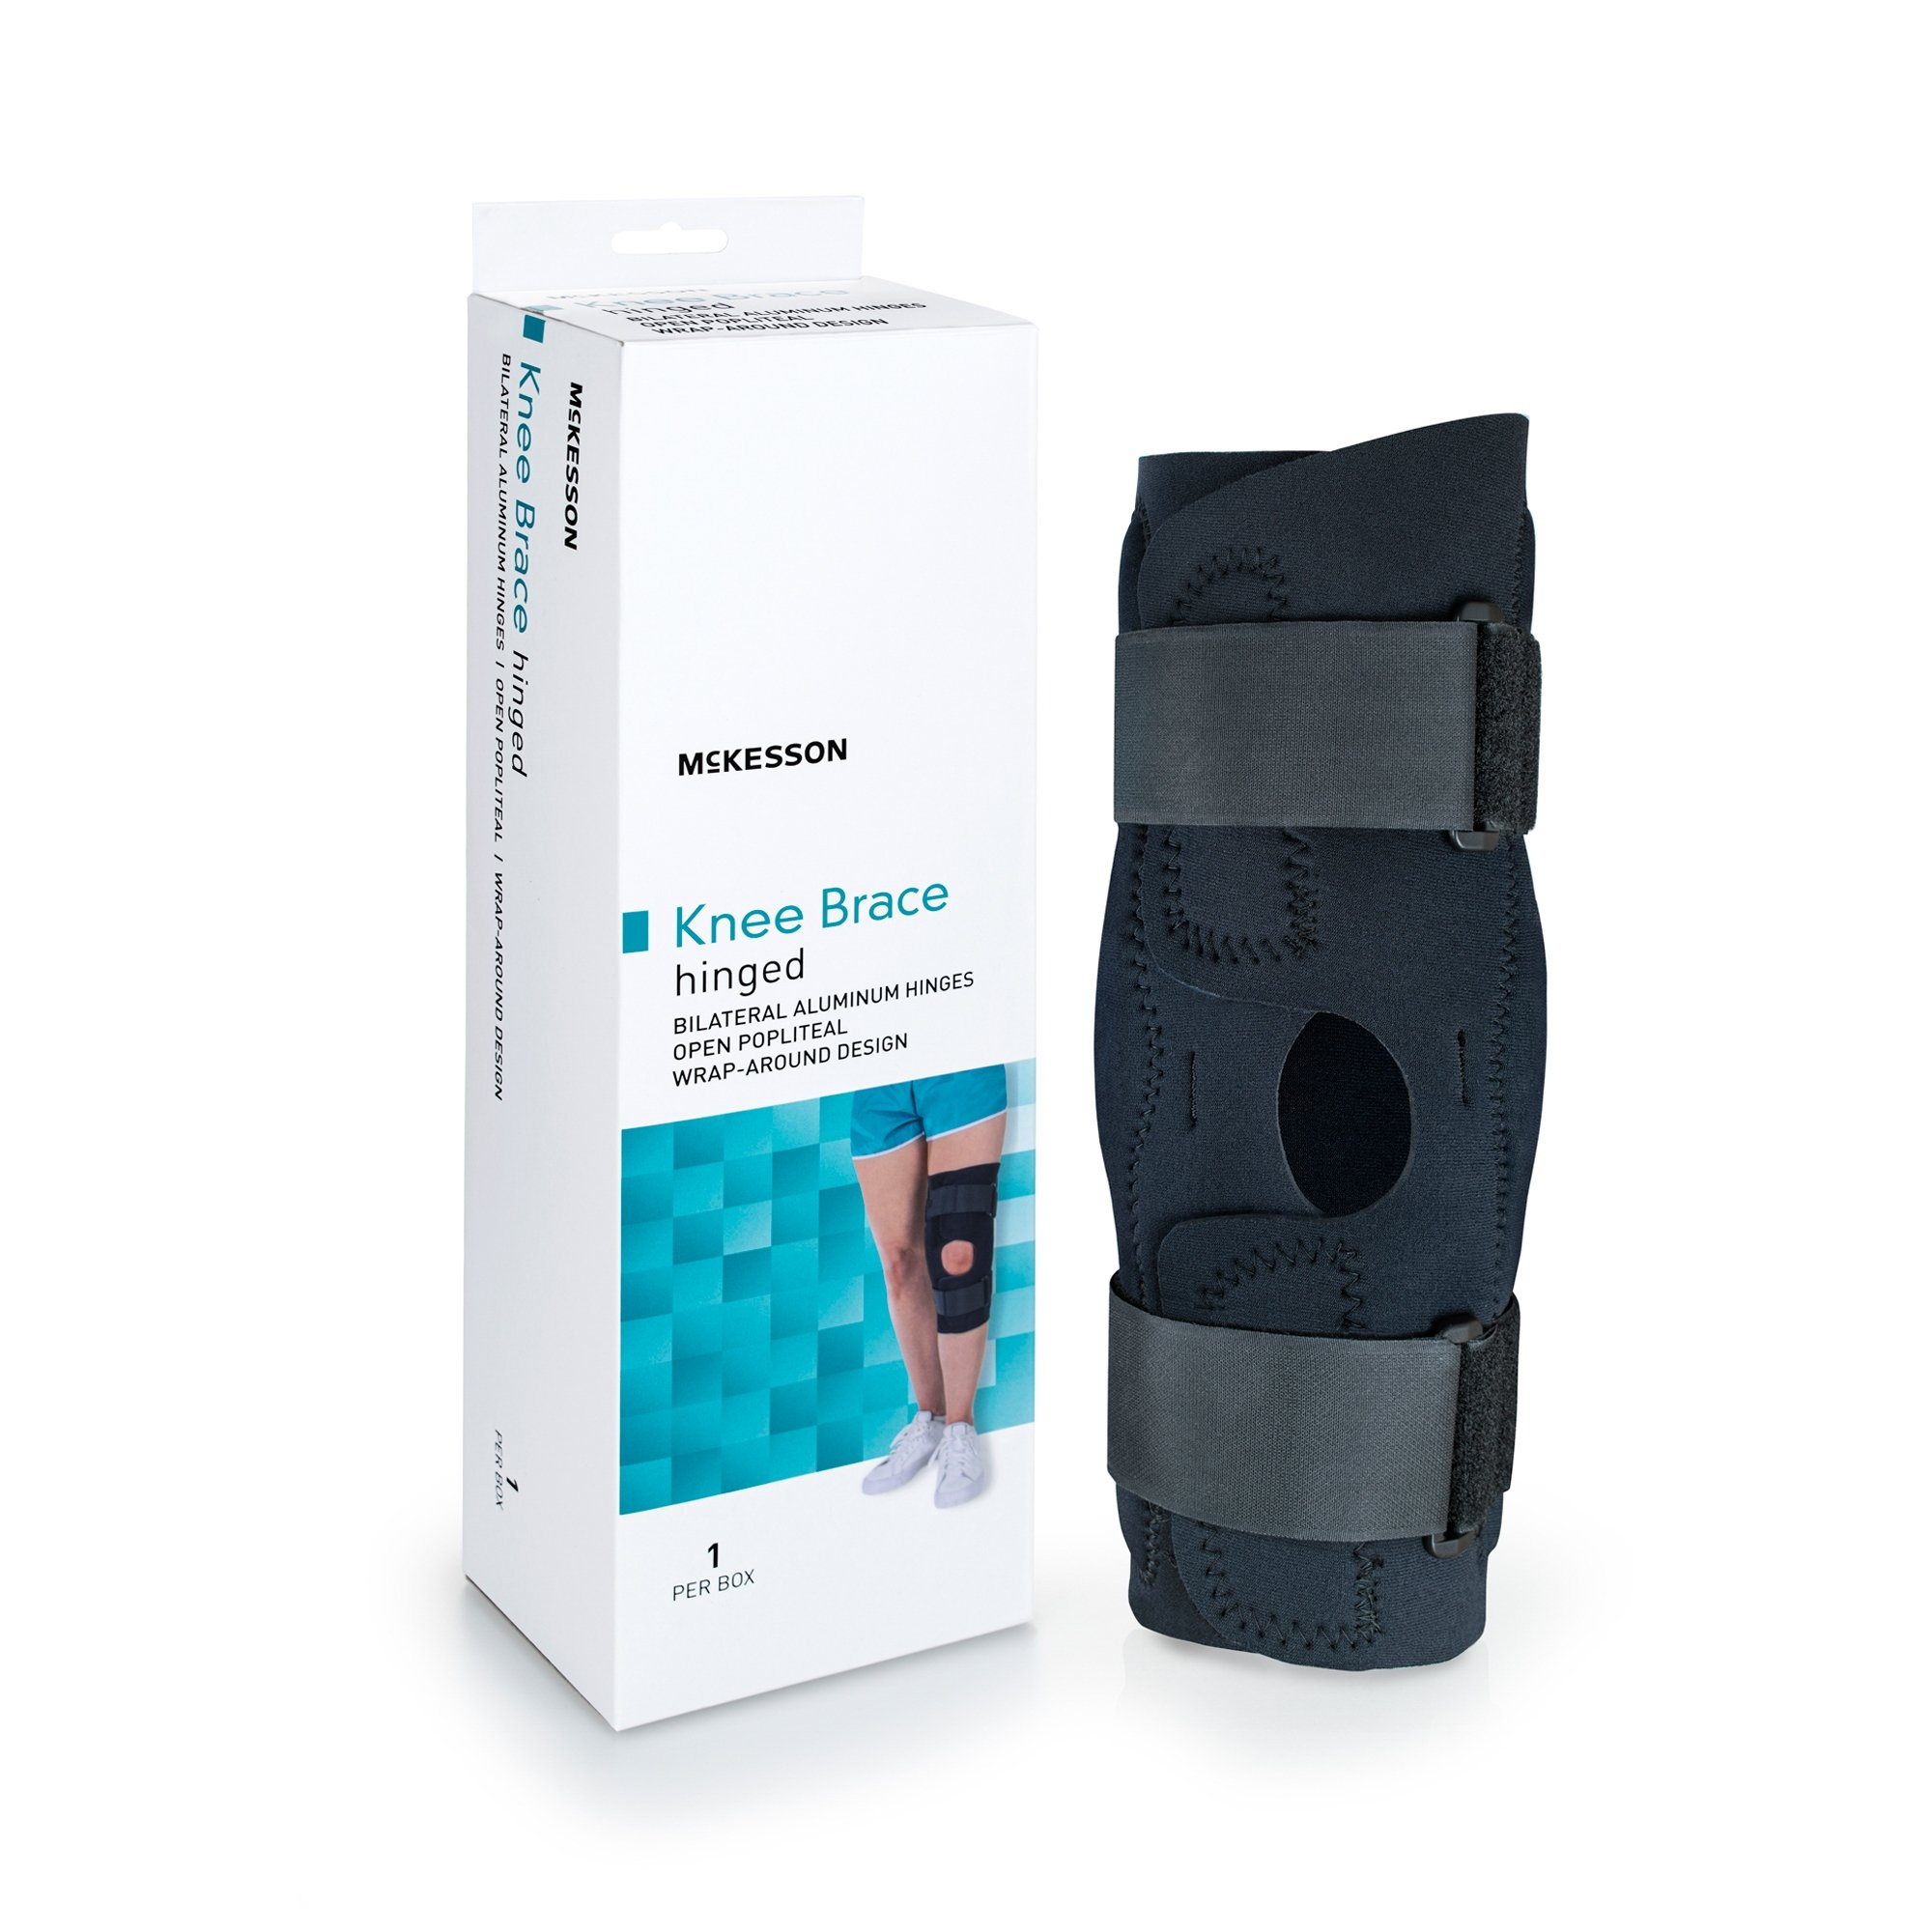 "McKesson Hinged Knee Brace, 155-81-82398, XL (23-25.5"") - 1 Each"